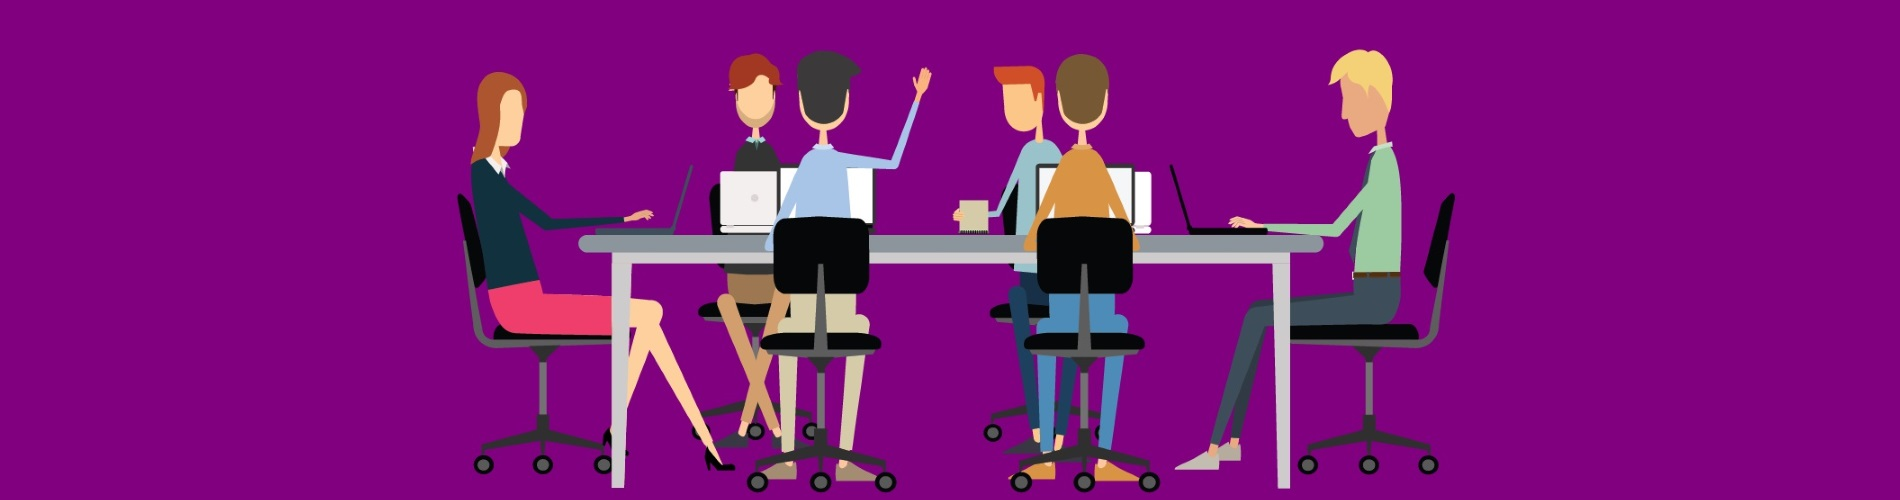 website development, software development, seo, social media marketing